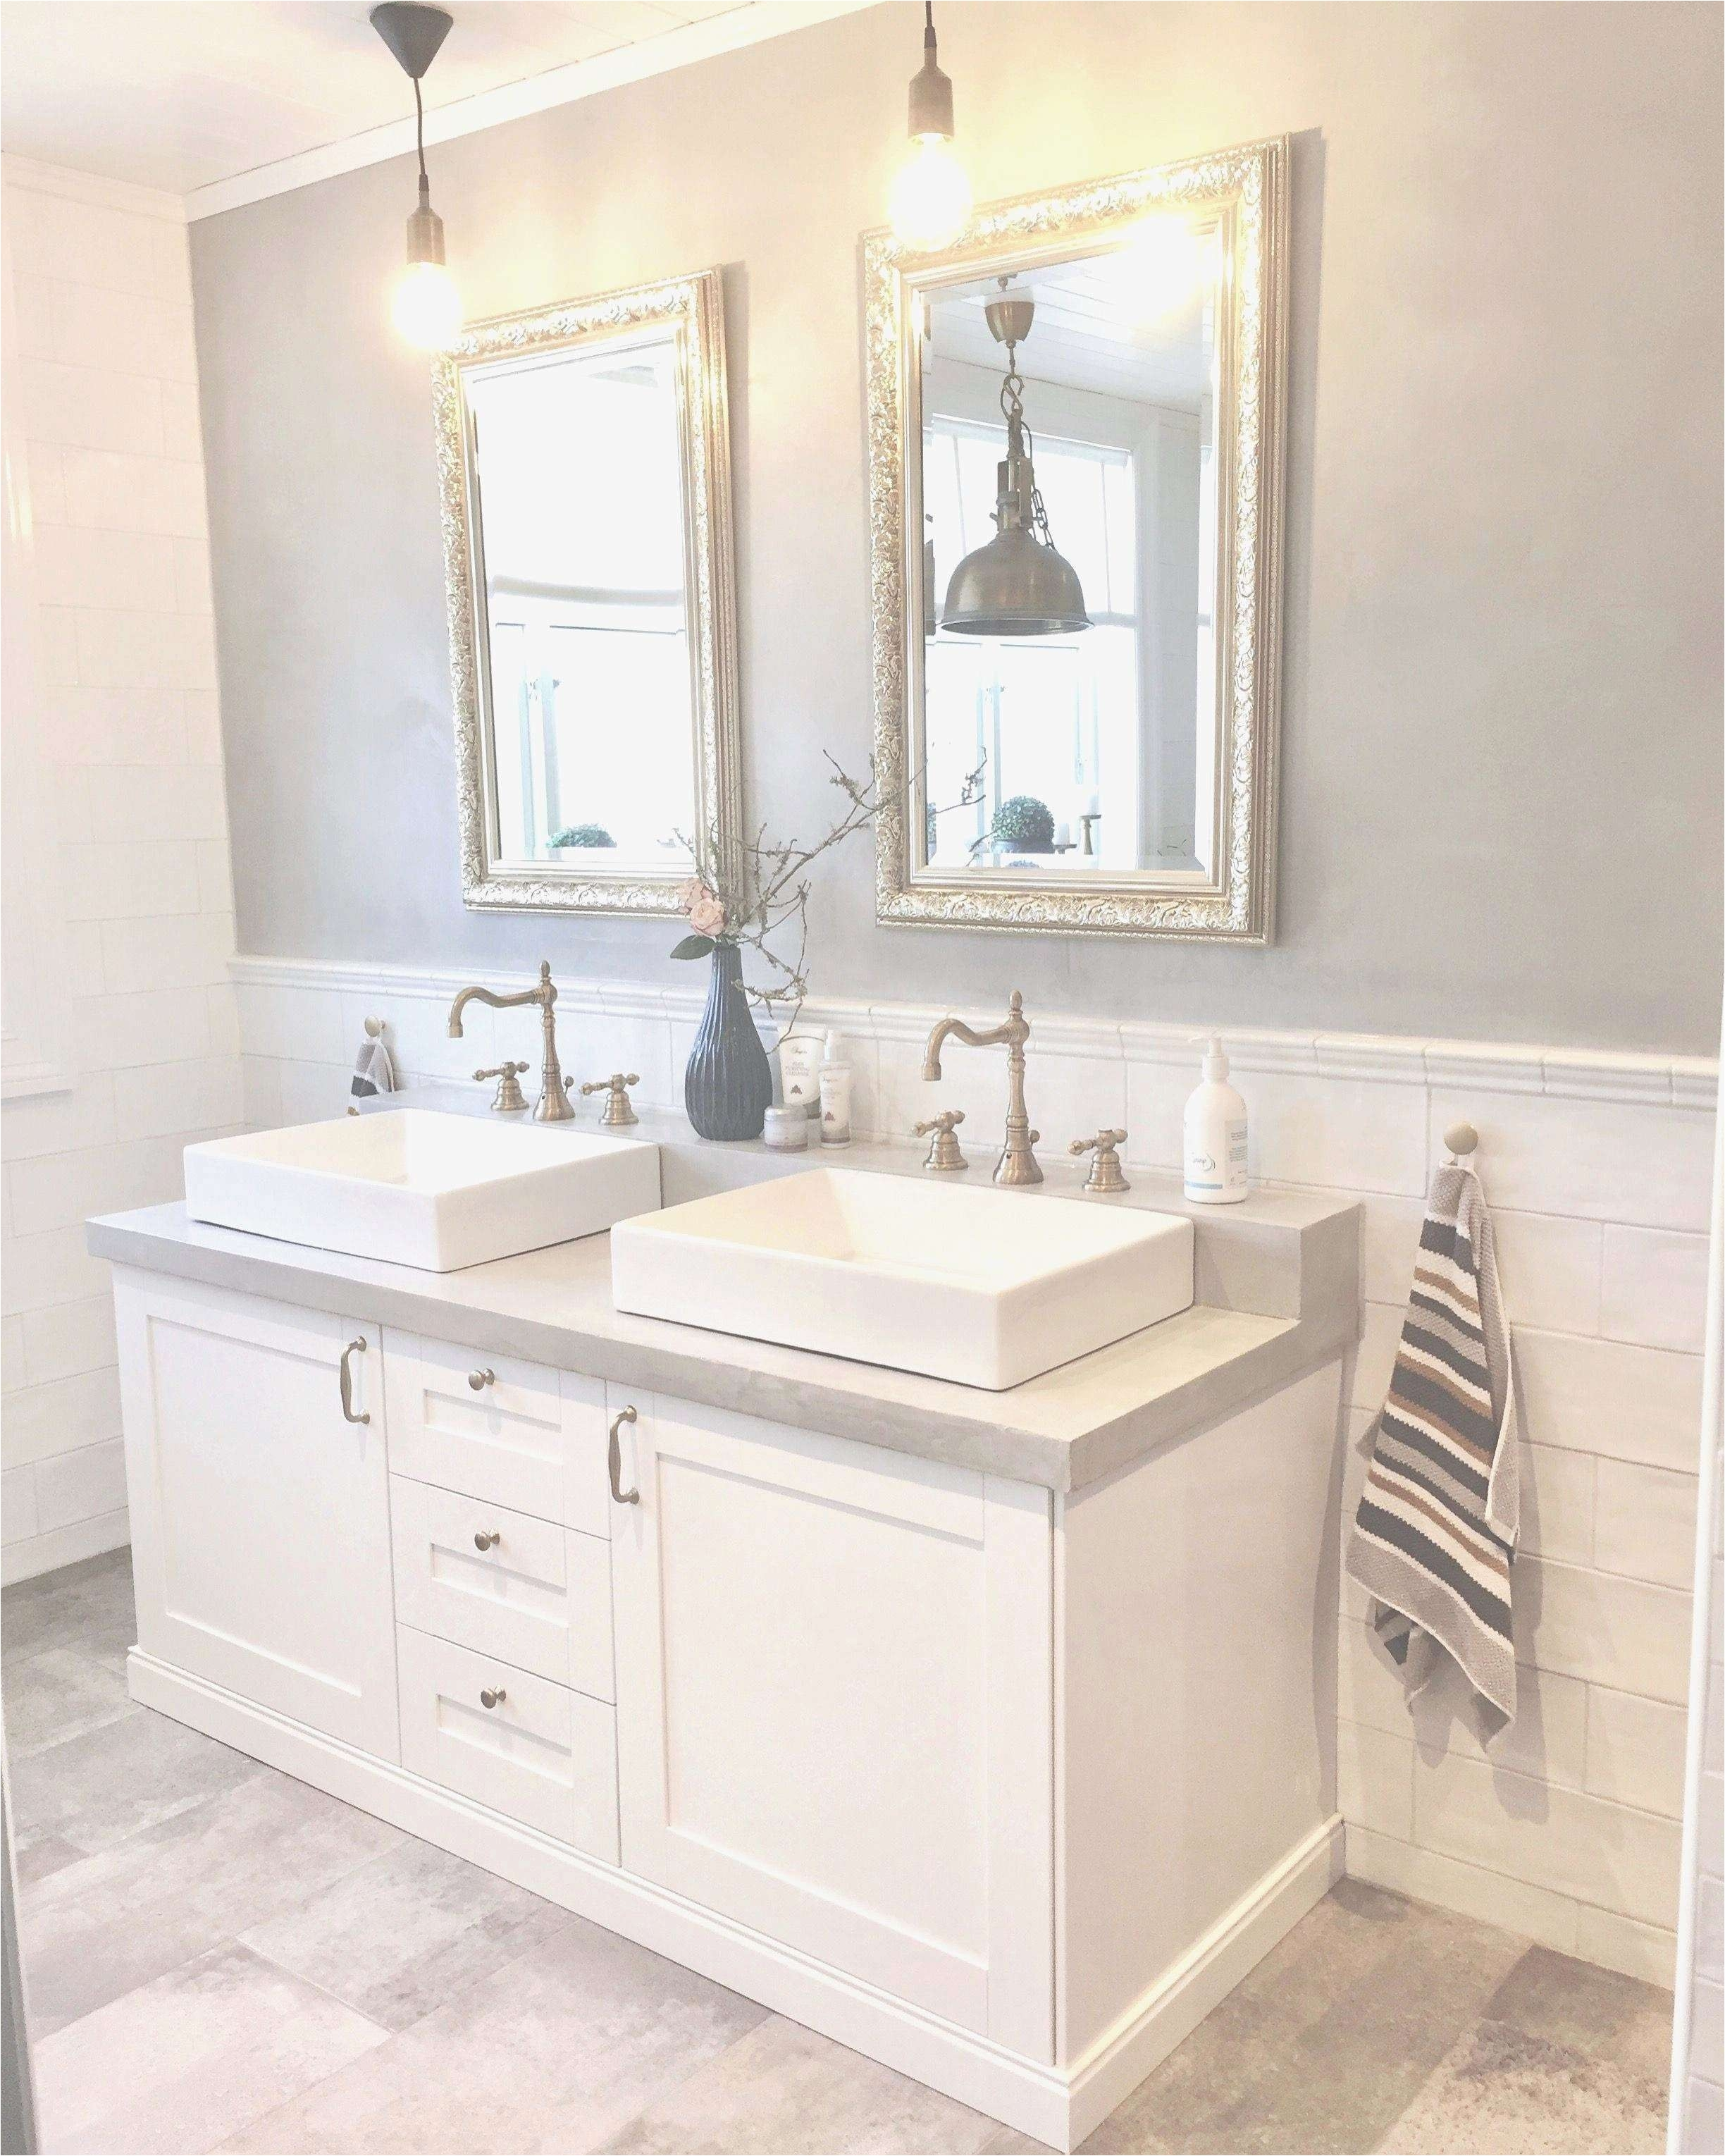 Nature Bathroom Design Ideas Gorgeous American Flag Bathroom Decor